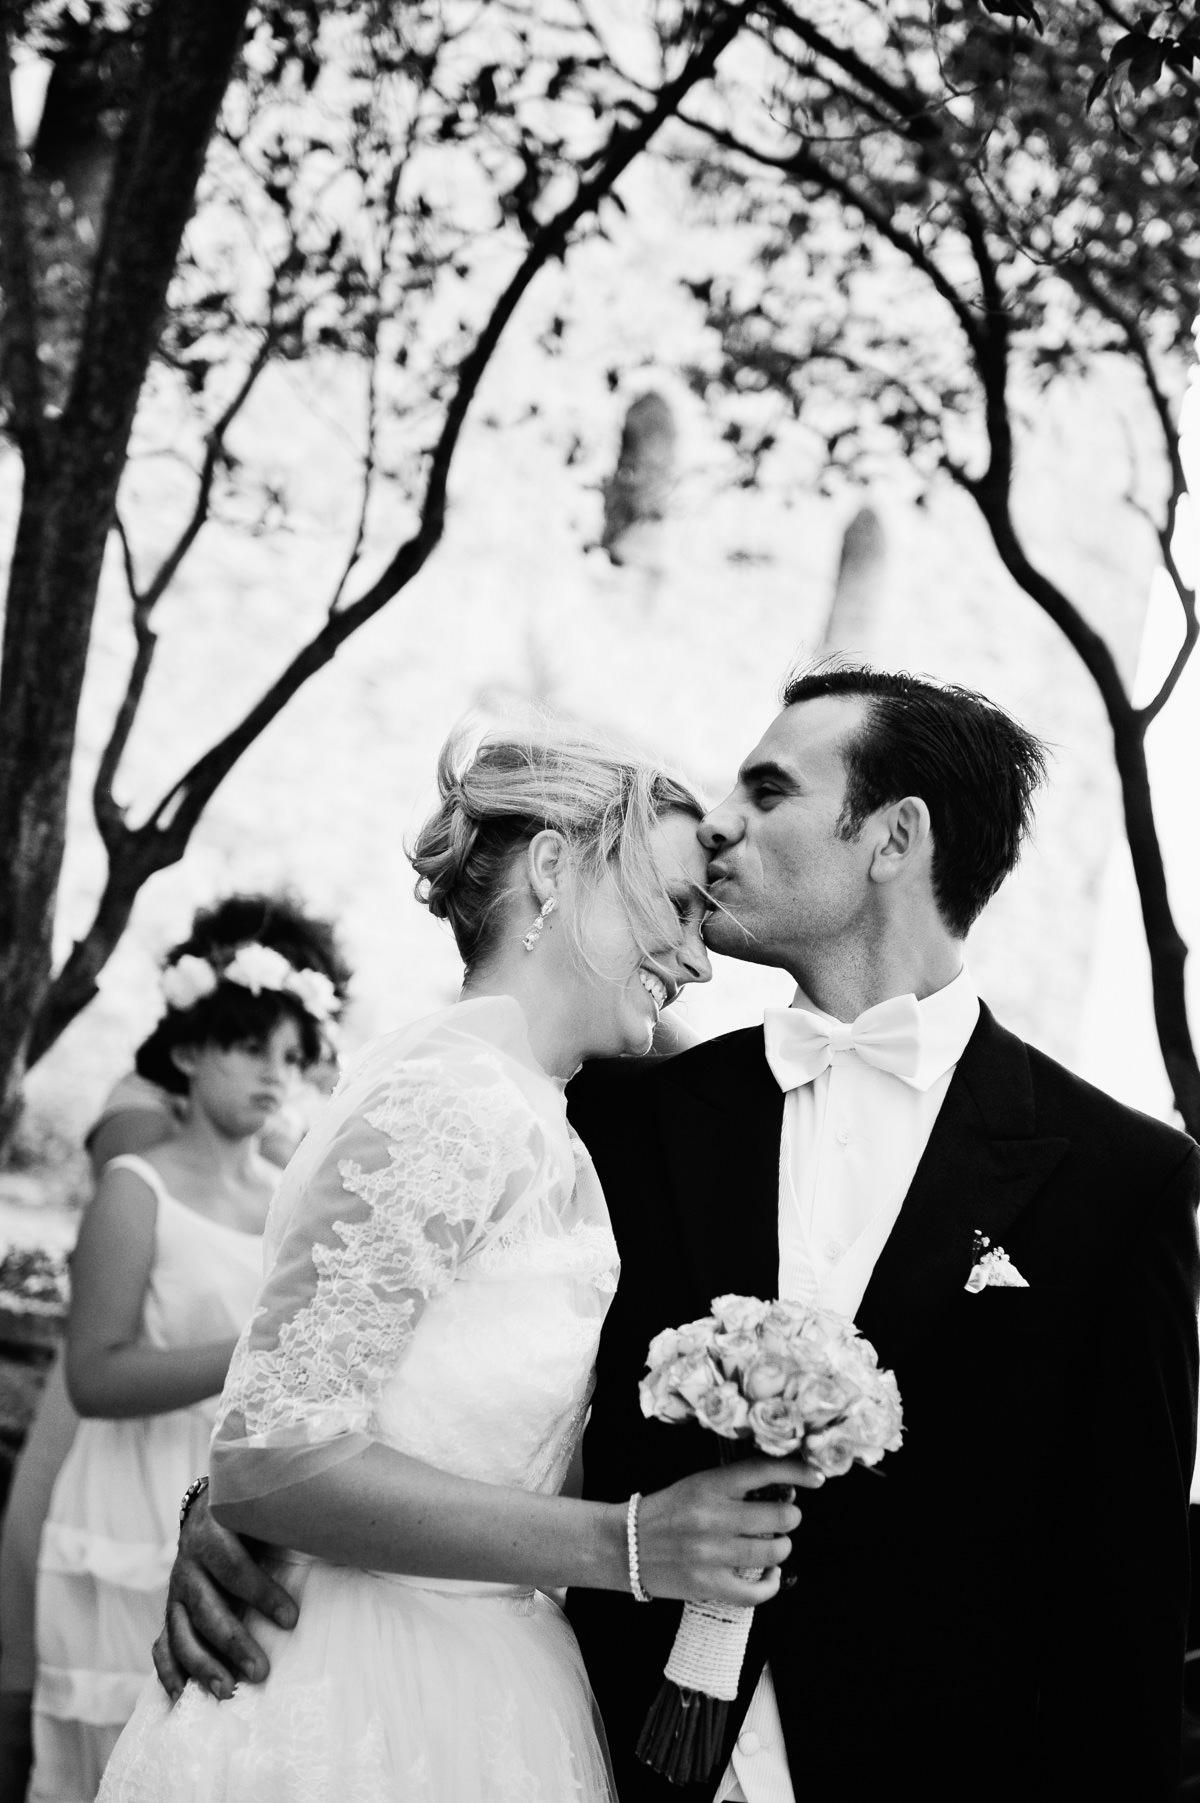 Philippa+Limoz wedding-49